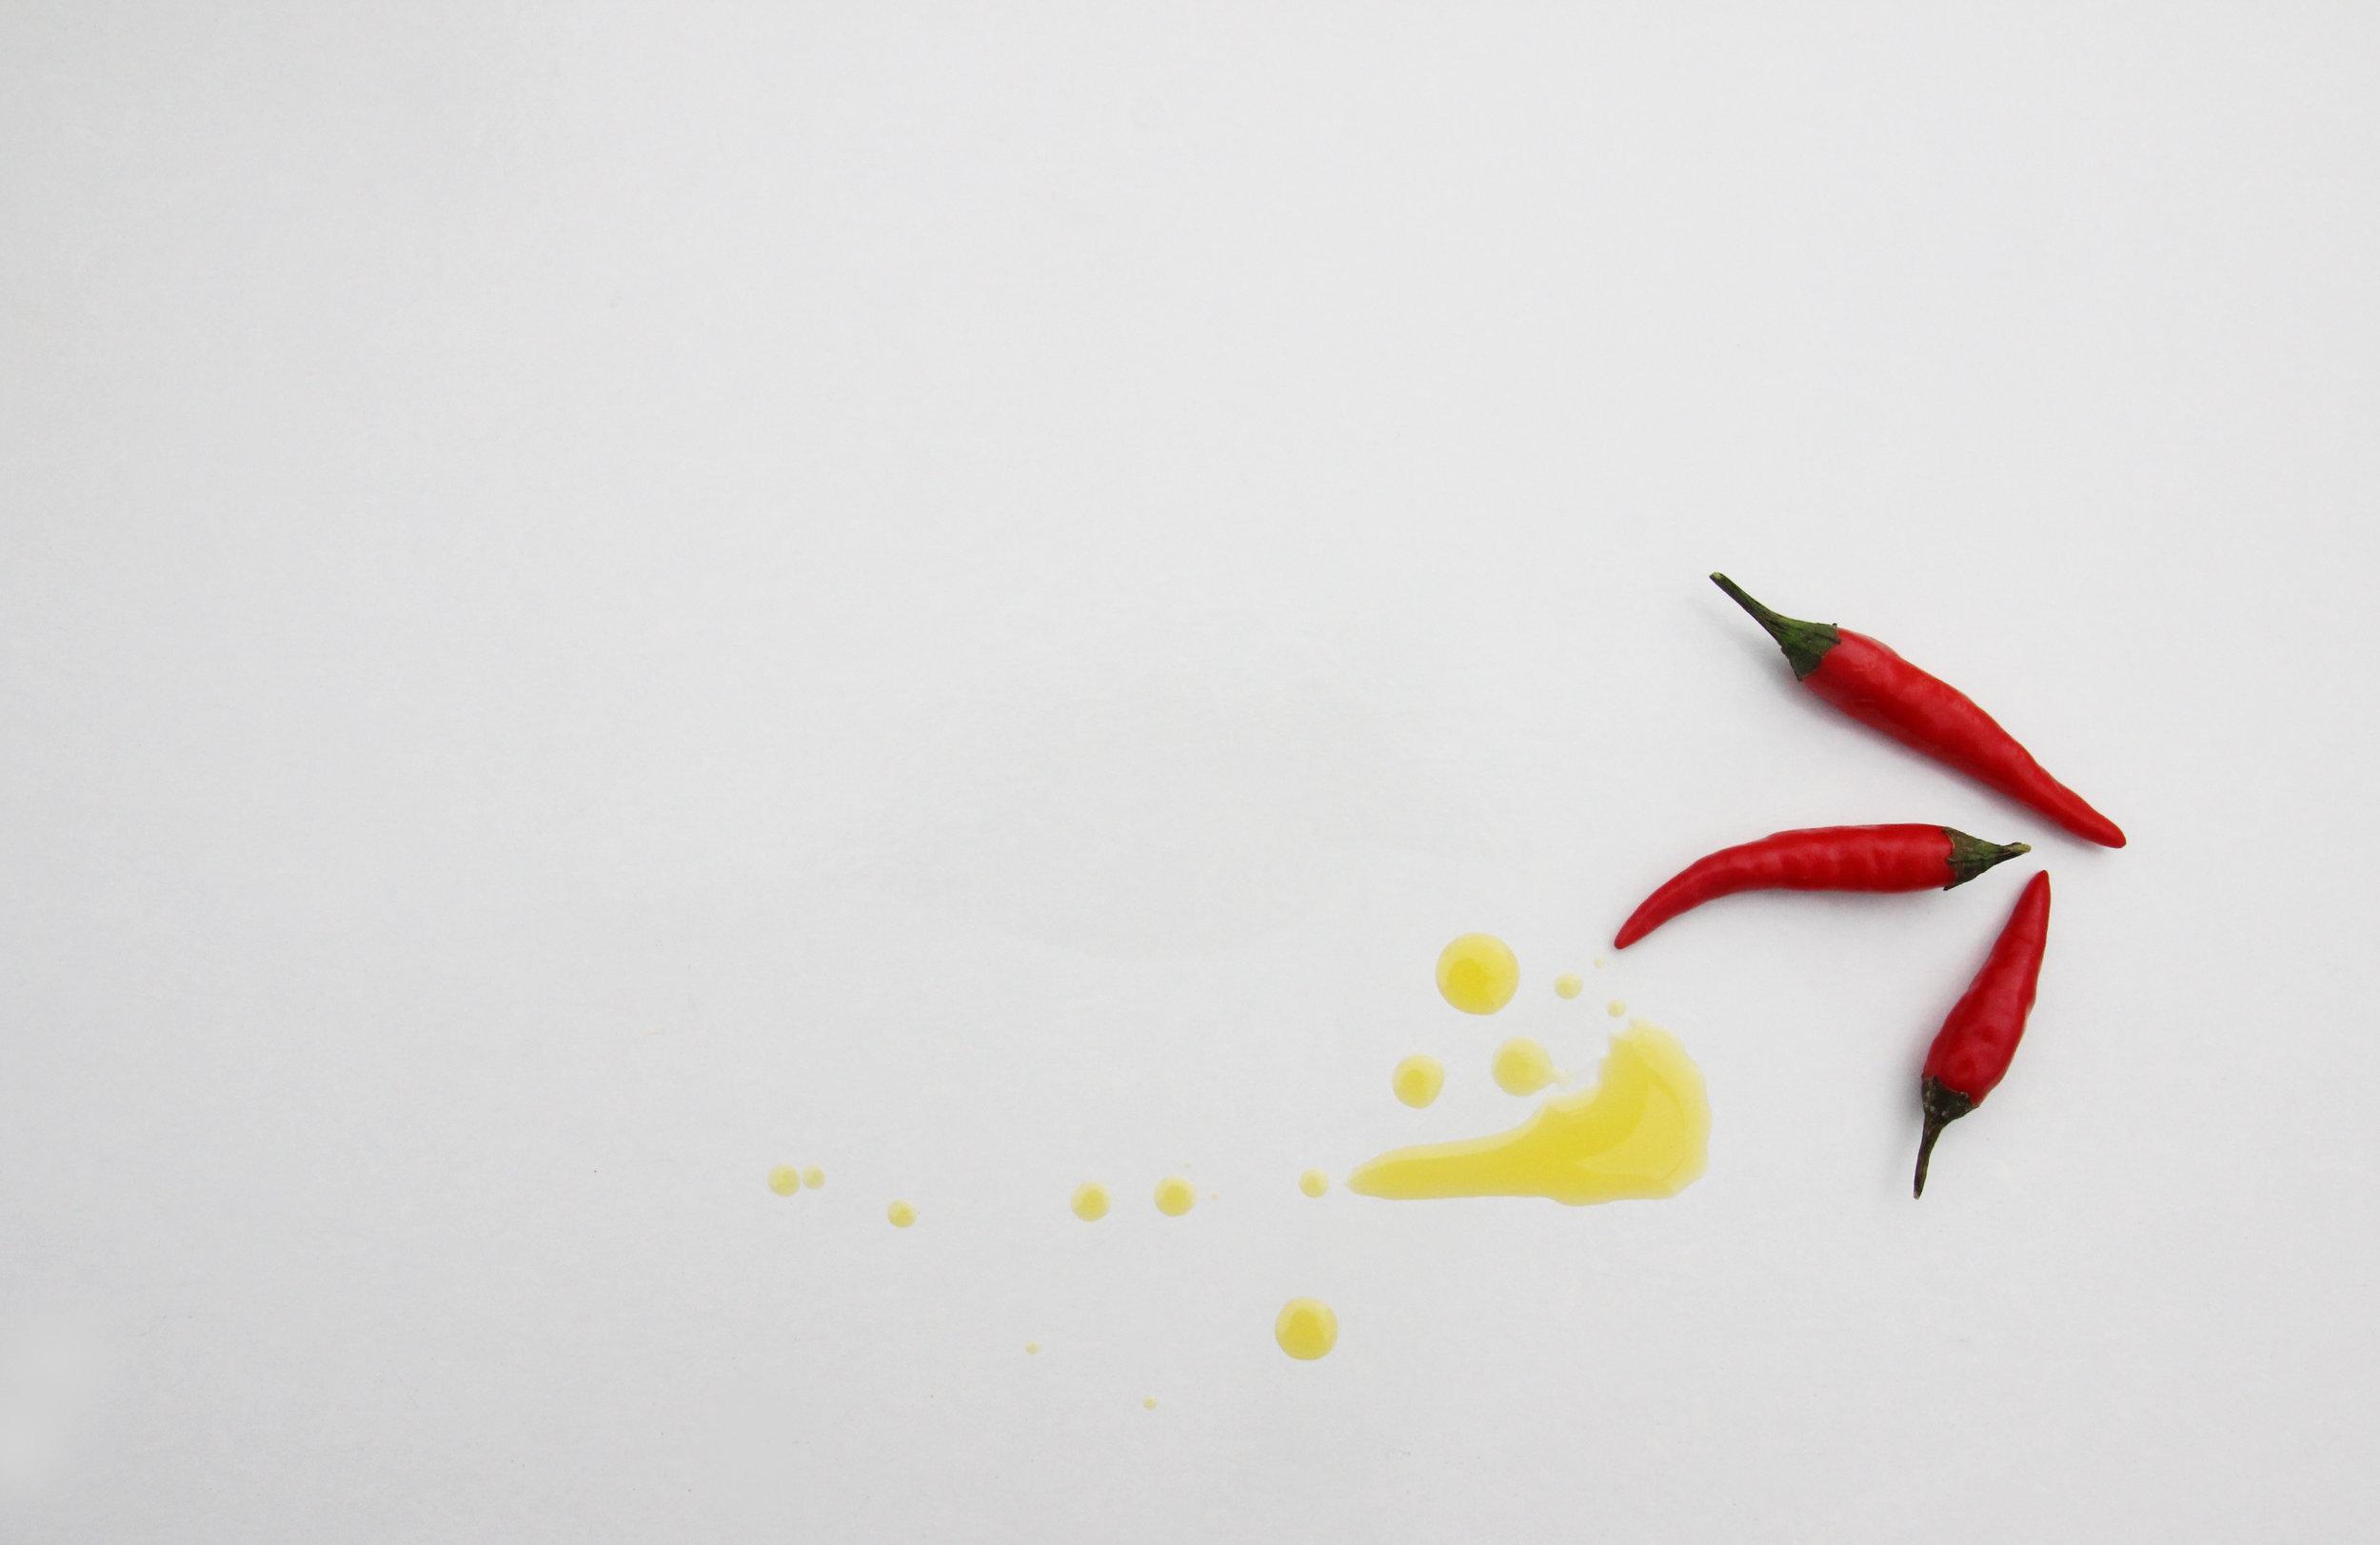 chilli rapeseed oil